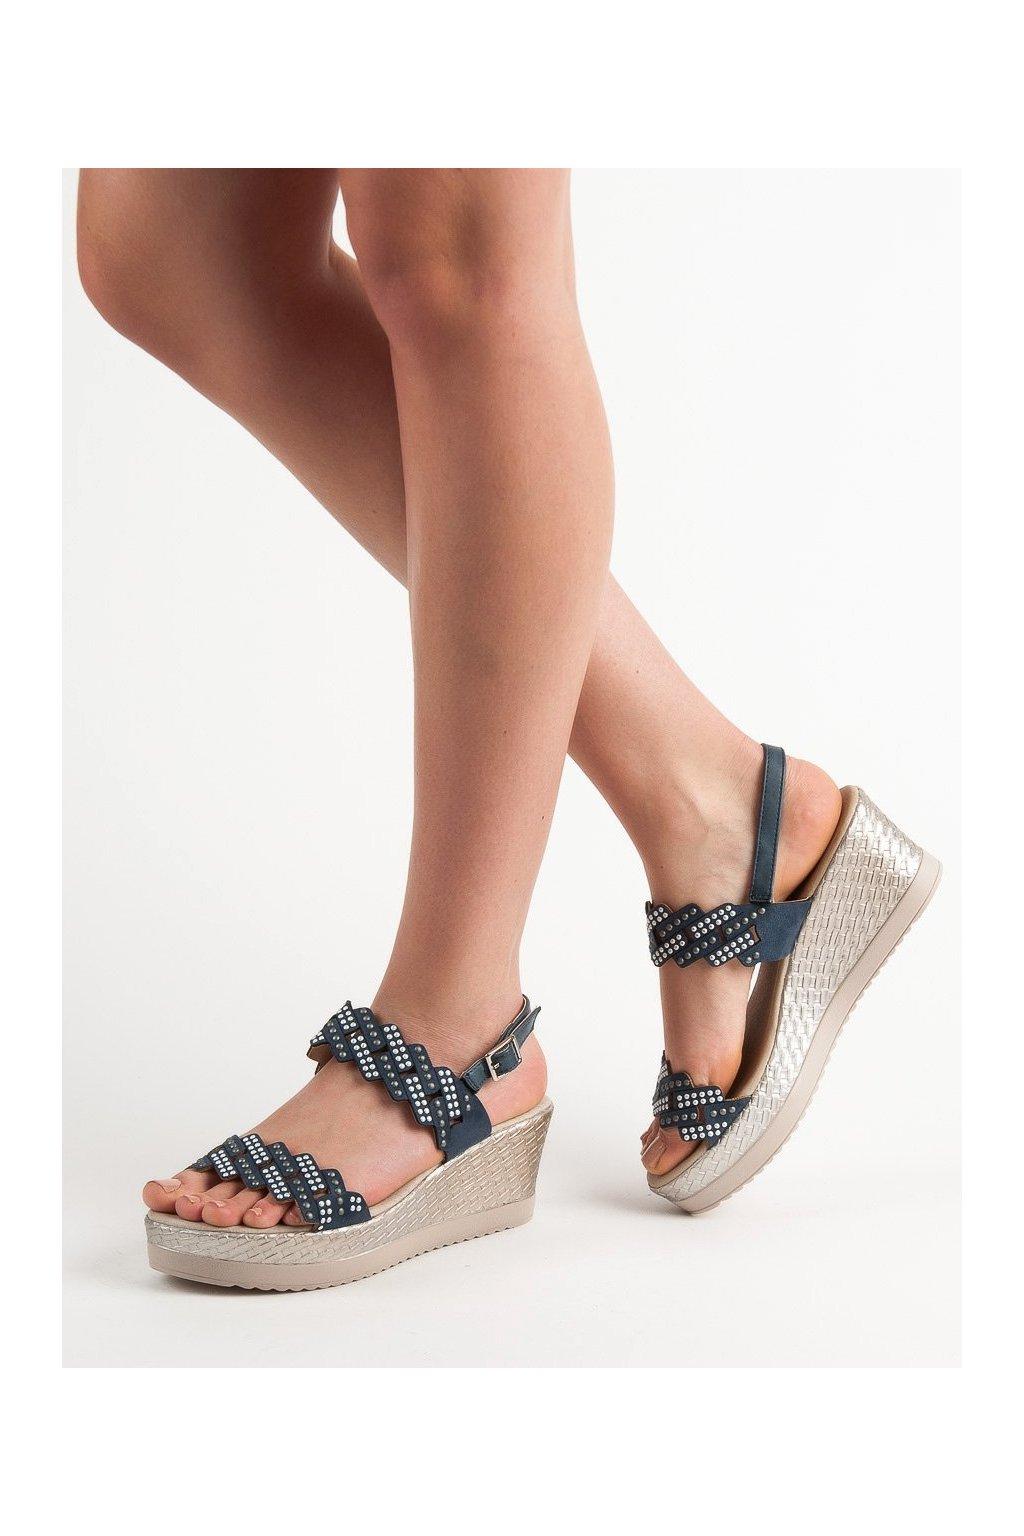 Modré sandále Aclys kod A119-04-01N